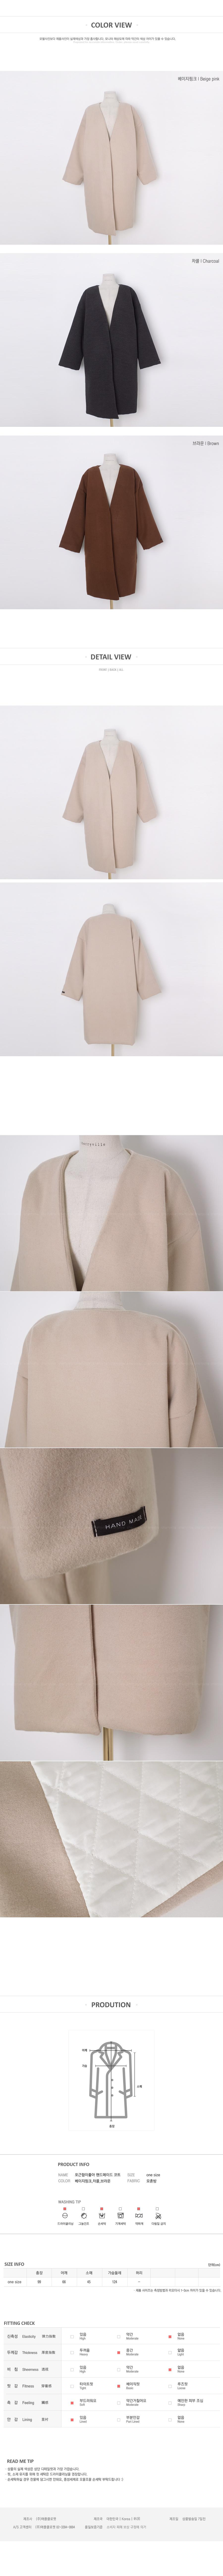 I like warmth, handmade coat